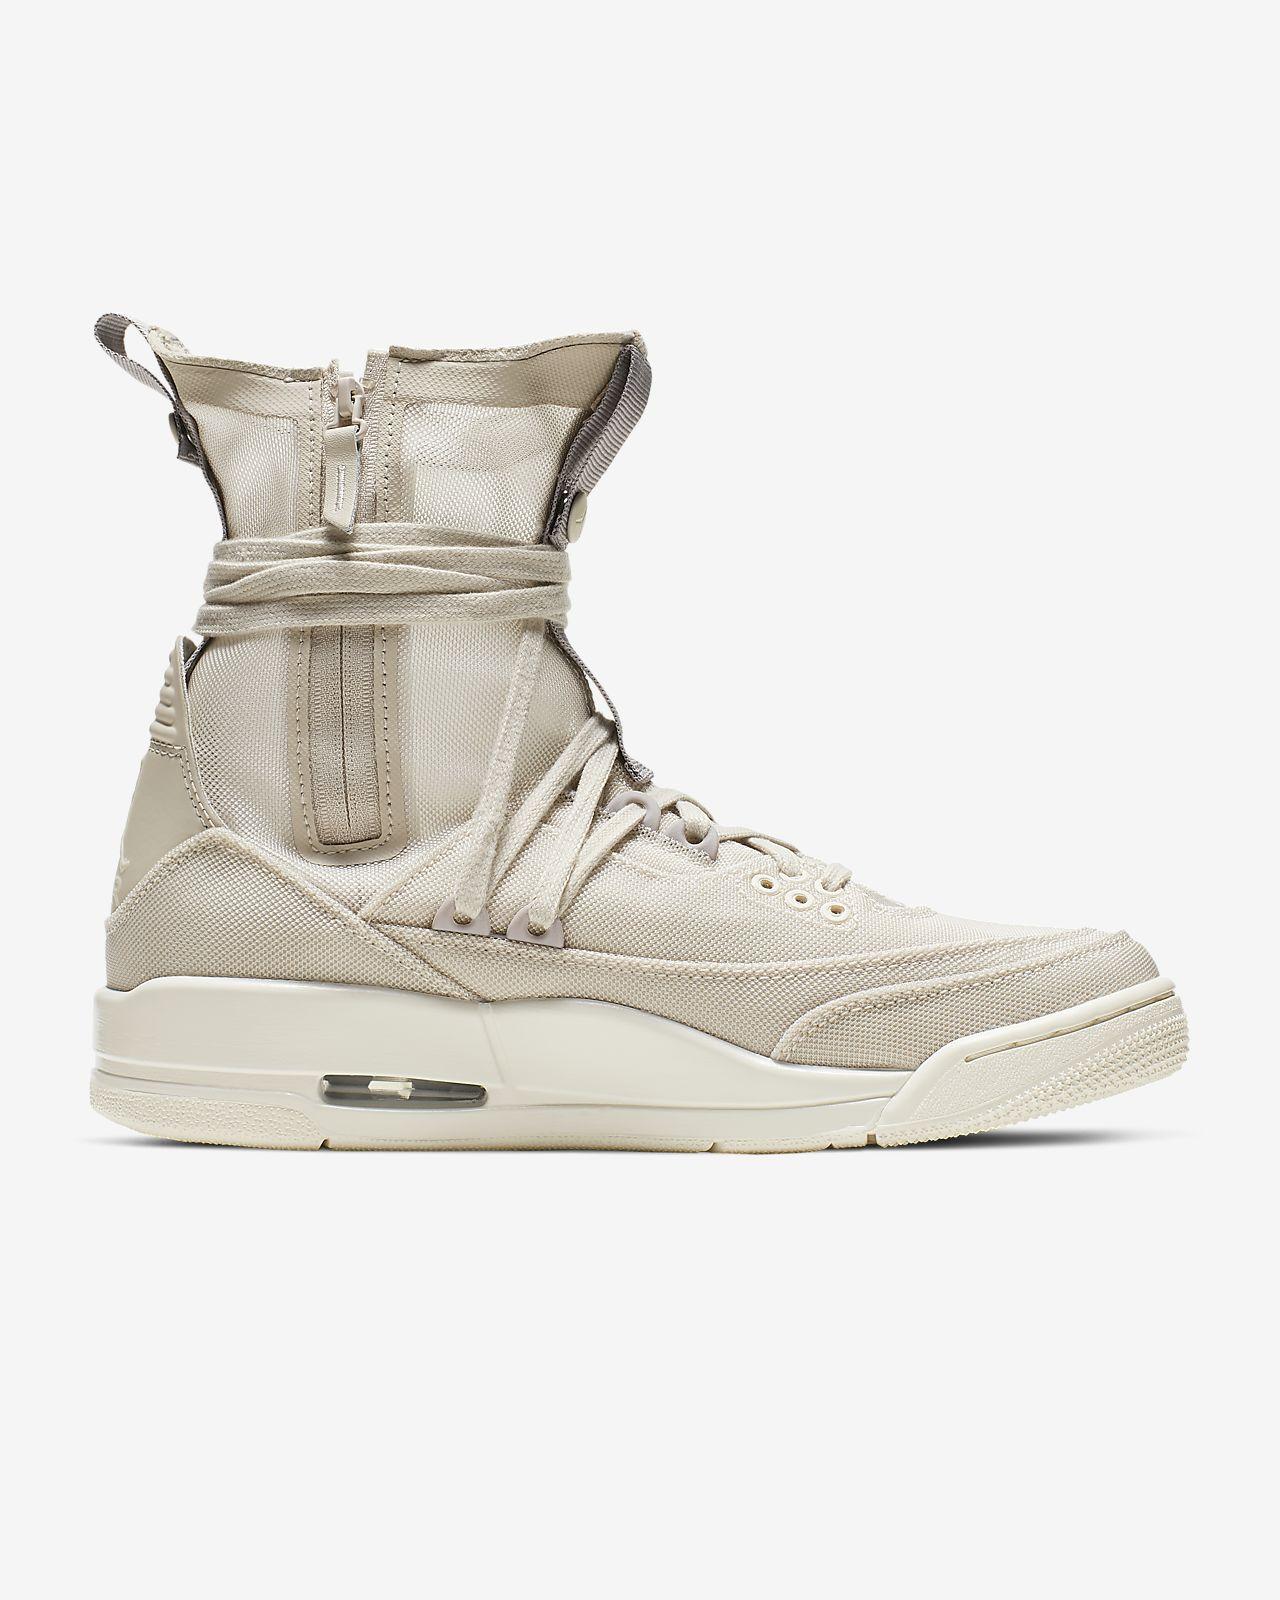 44161acd0670 Air Jordan 3 Retro Explorer Lite XX Women s Shoe. Nike.com AU